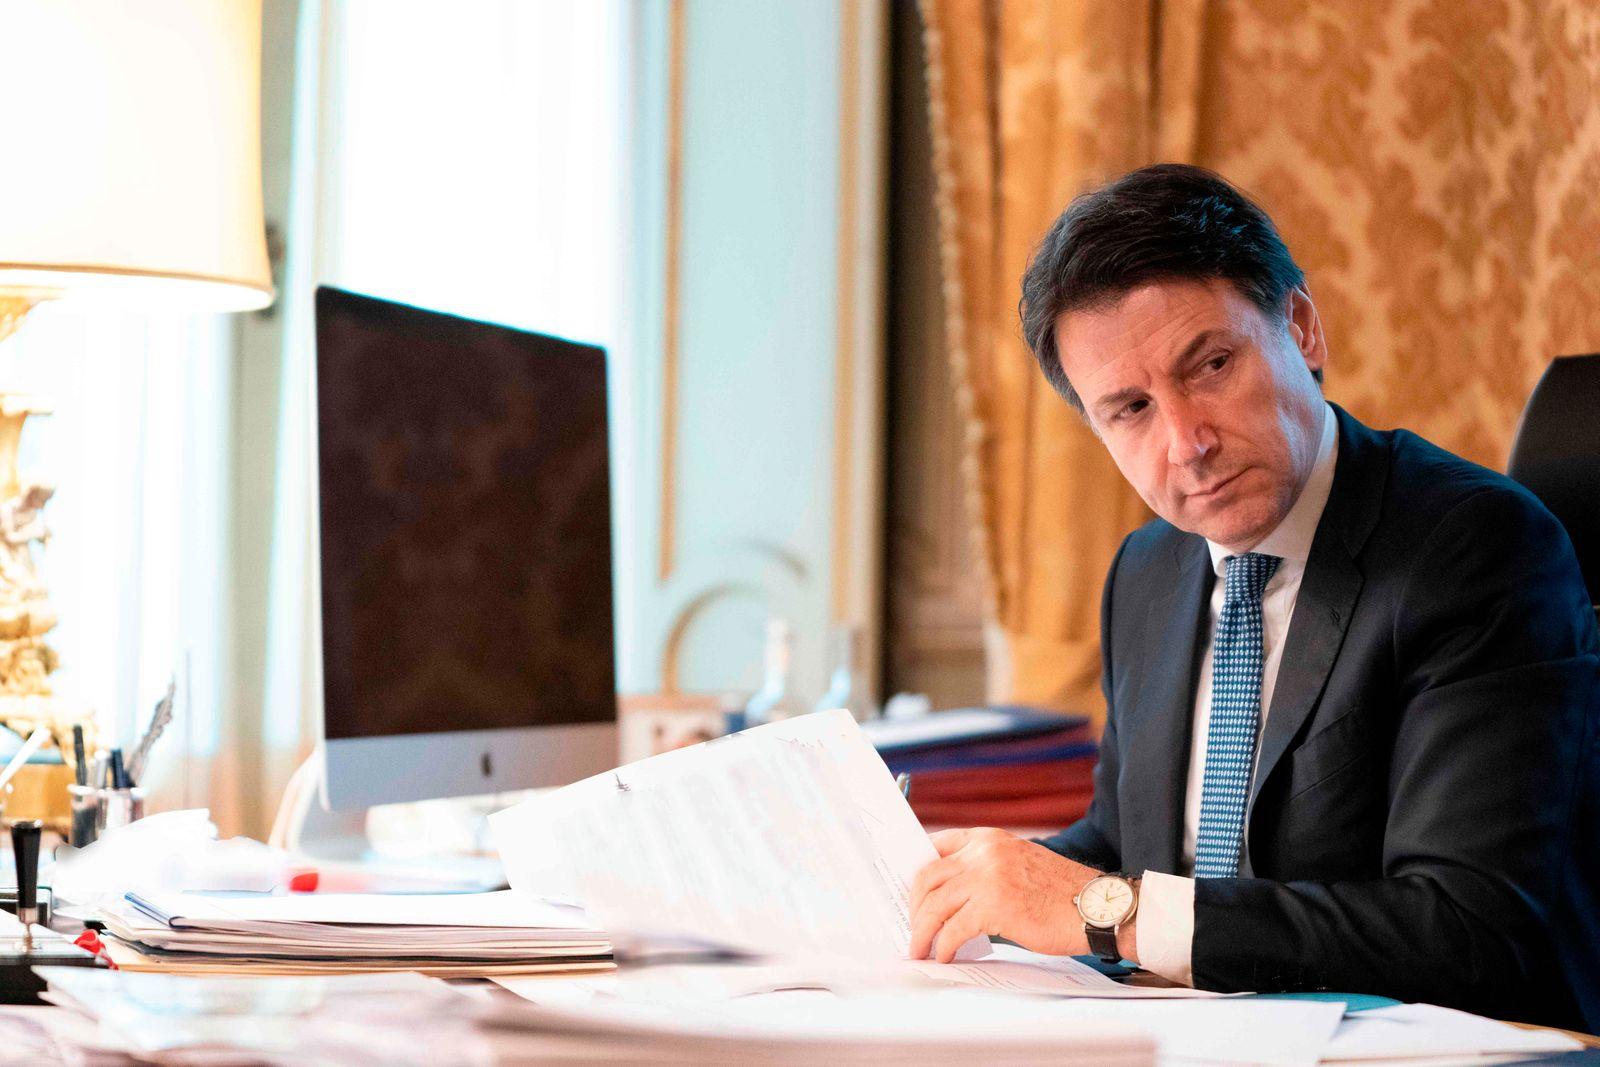 ITALY-EU-HEALTH-VIRUS-POLITICS-SUMMIT-VIEDOCONFERENCE